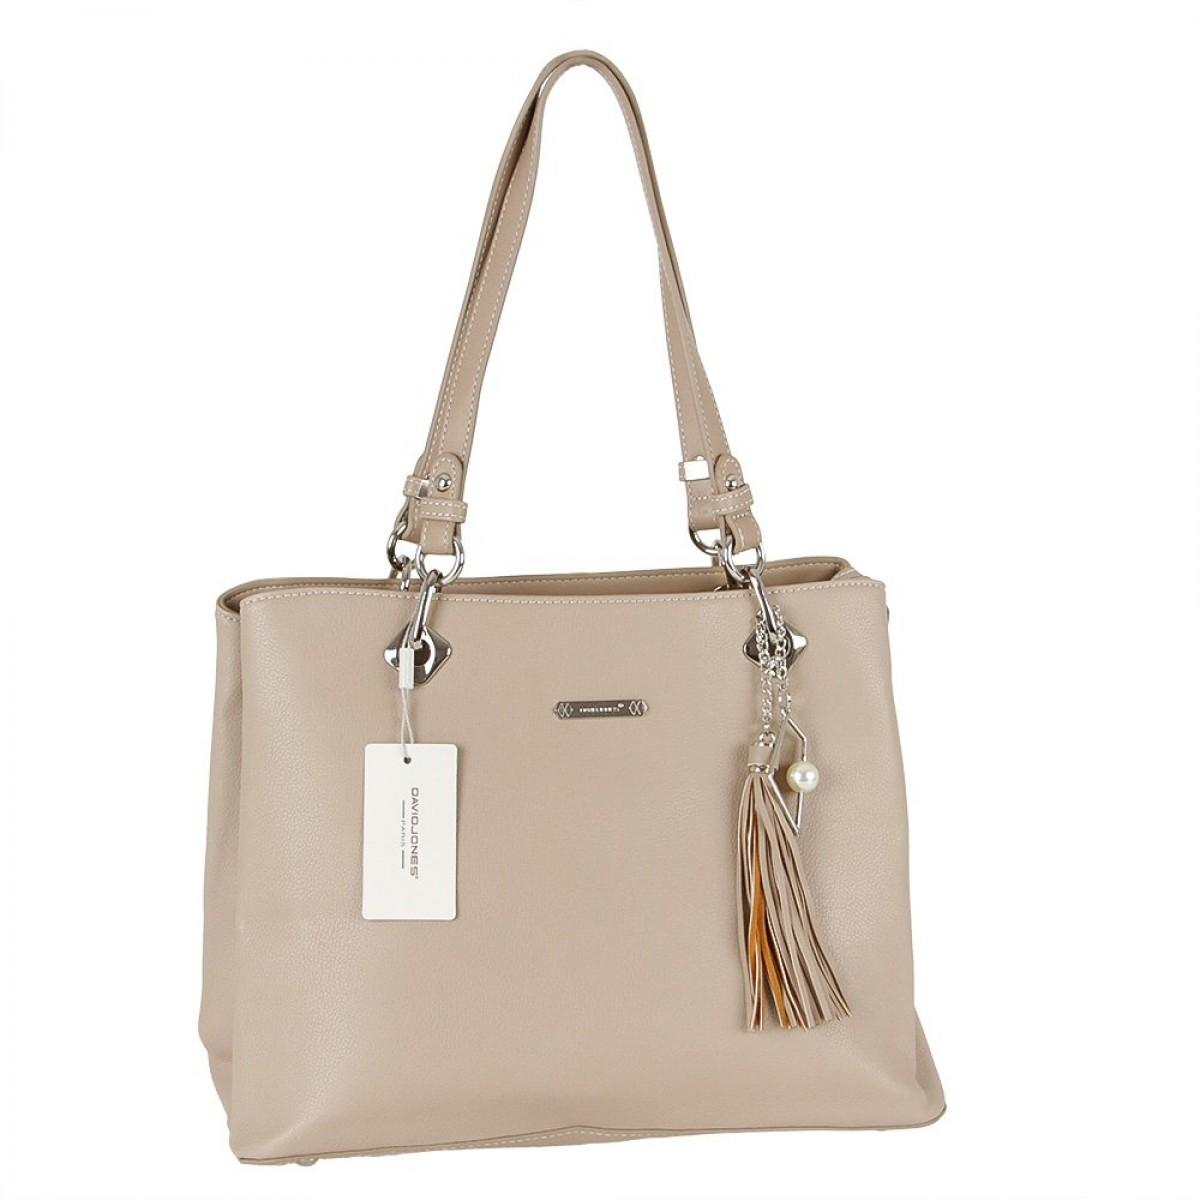 Жіноча сумка David Jones CM5621A L.CAMEL